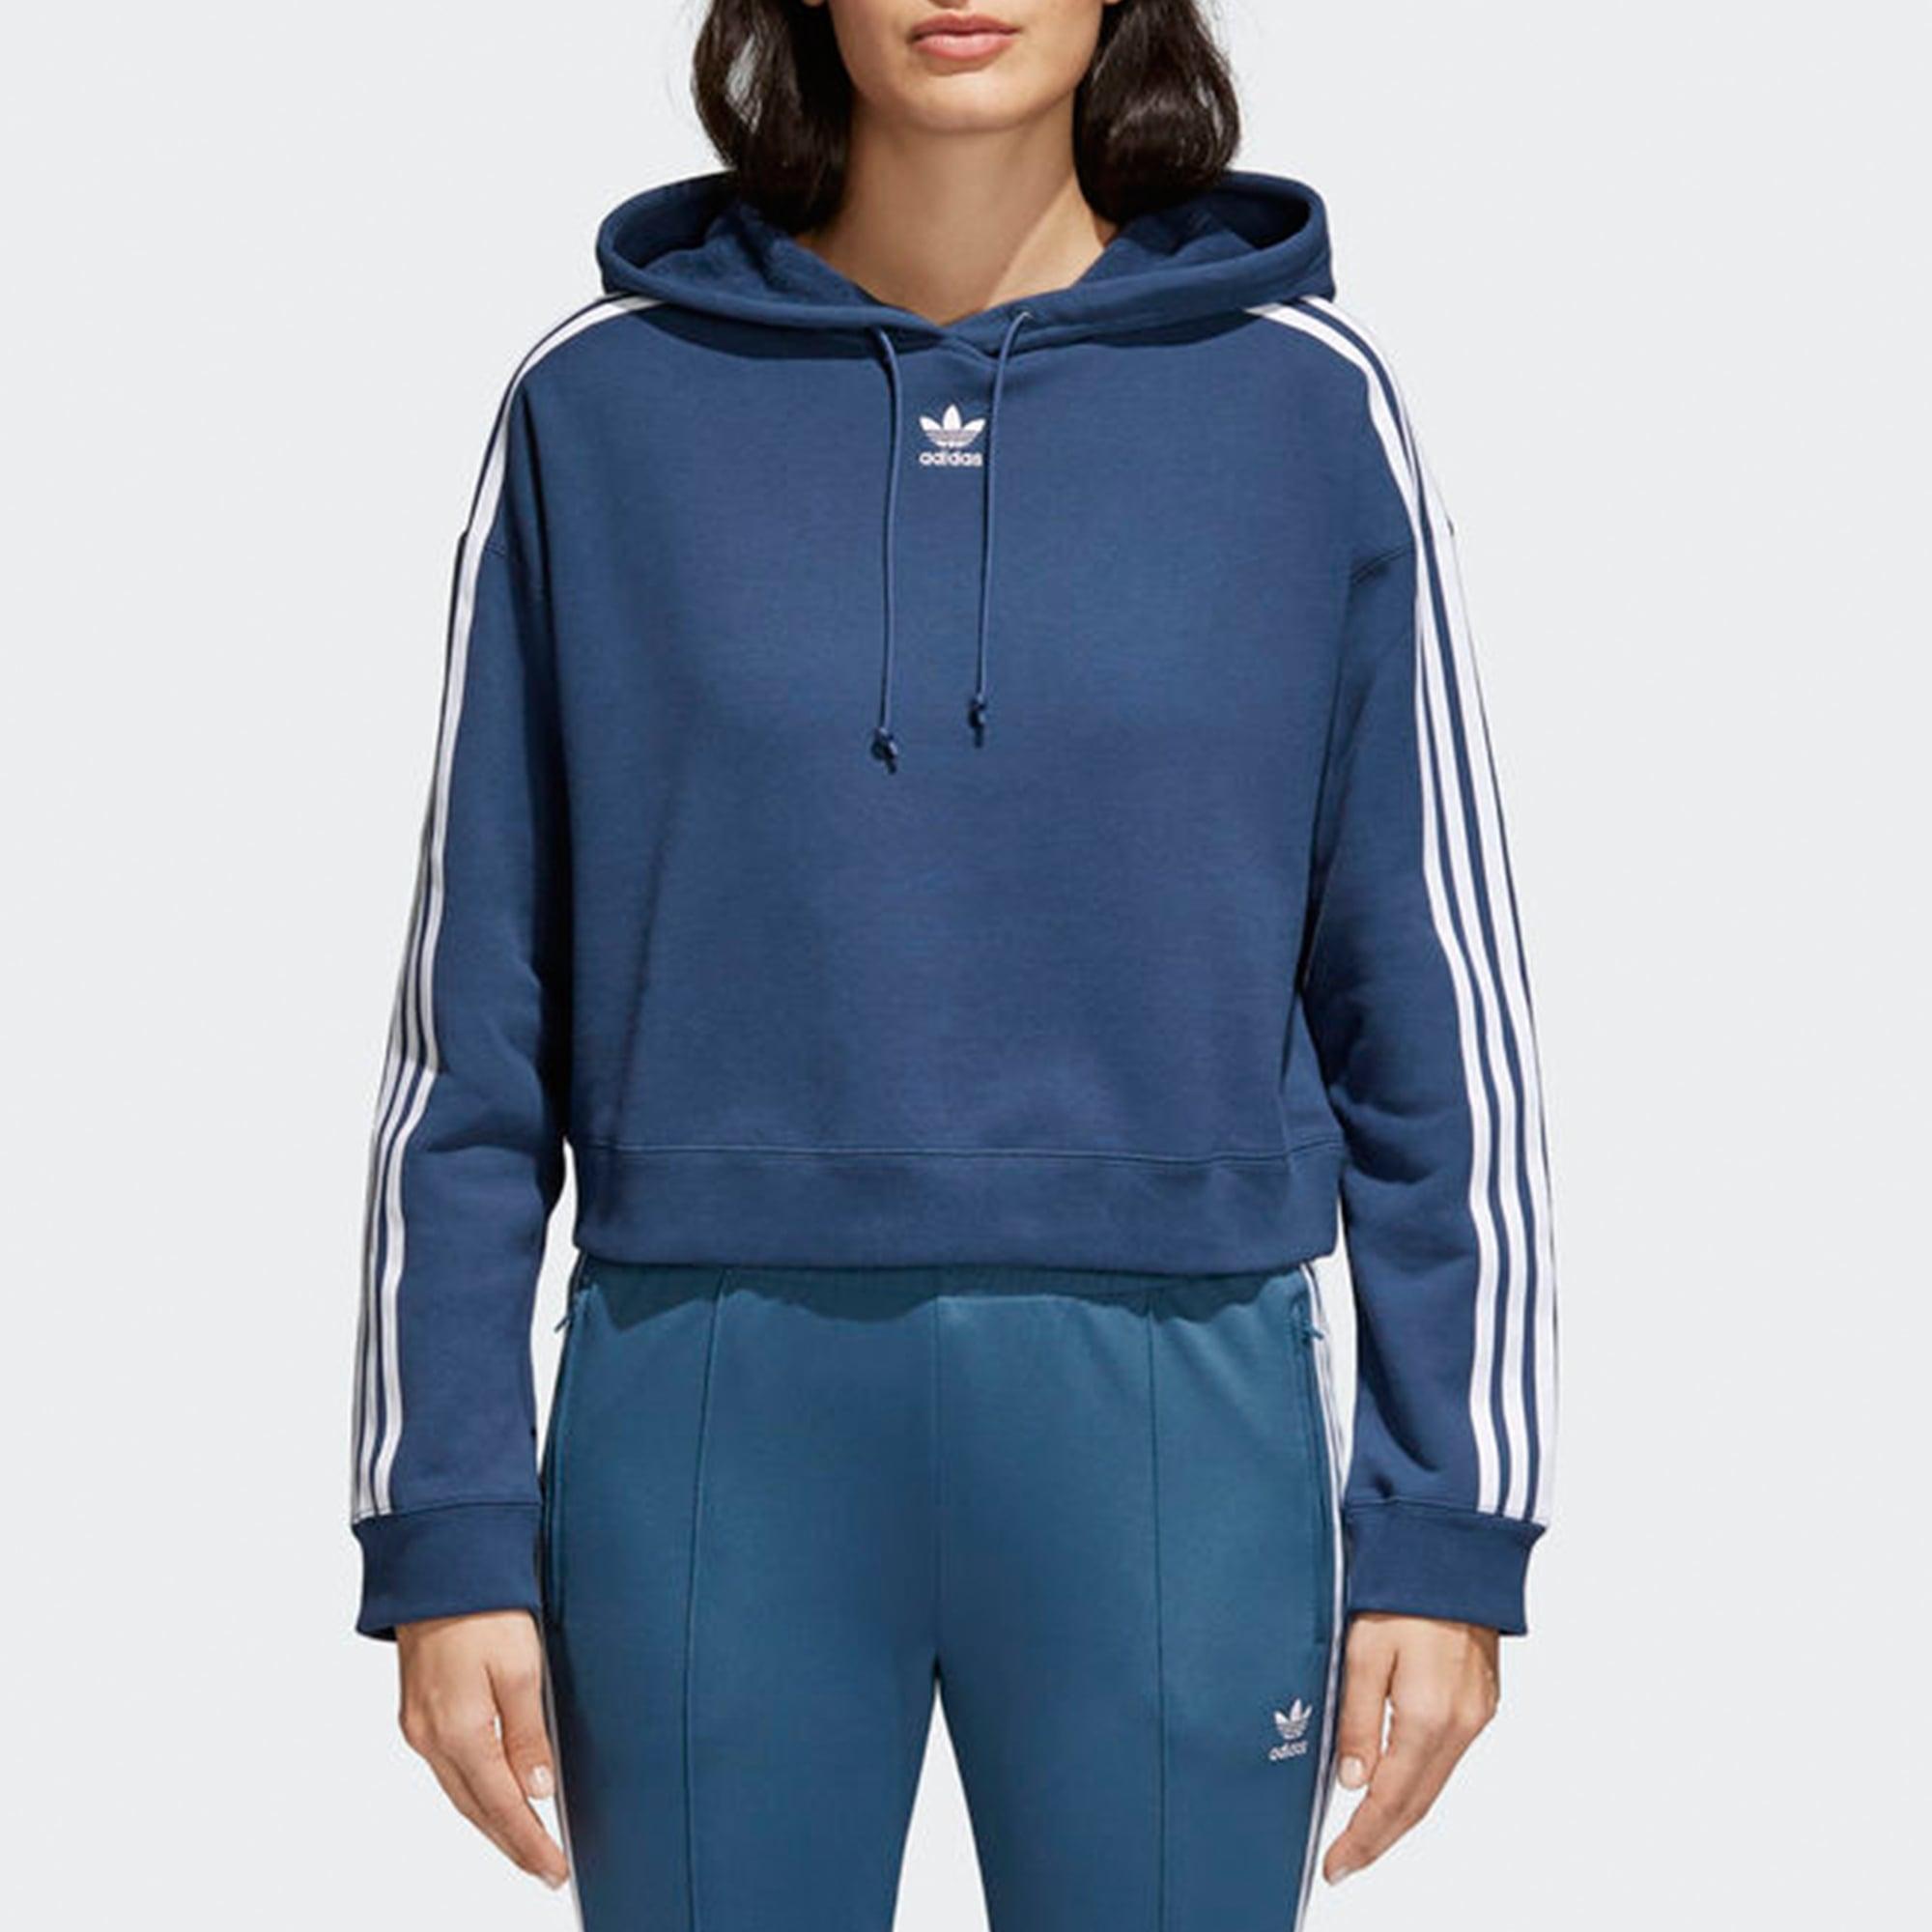 adidas Originals Womens Womens Mineral Blue Cropped Hoodie